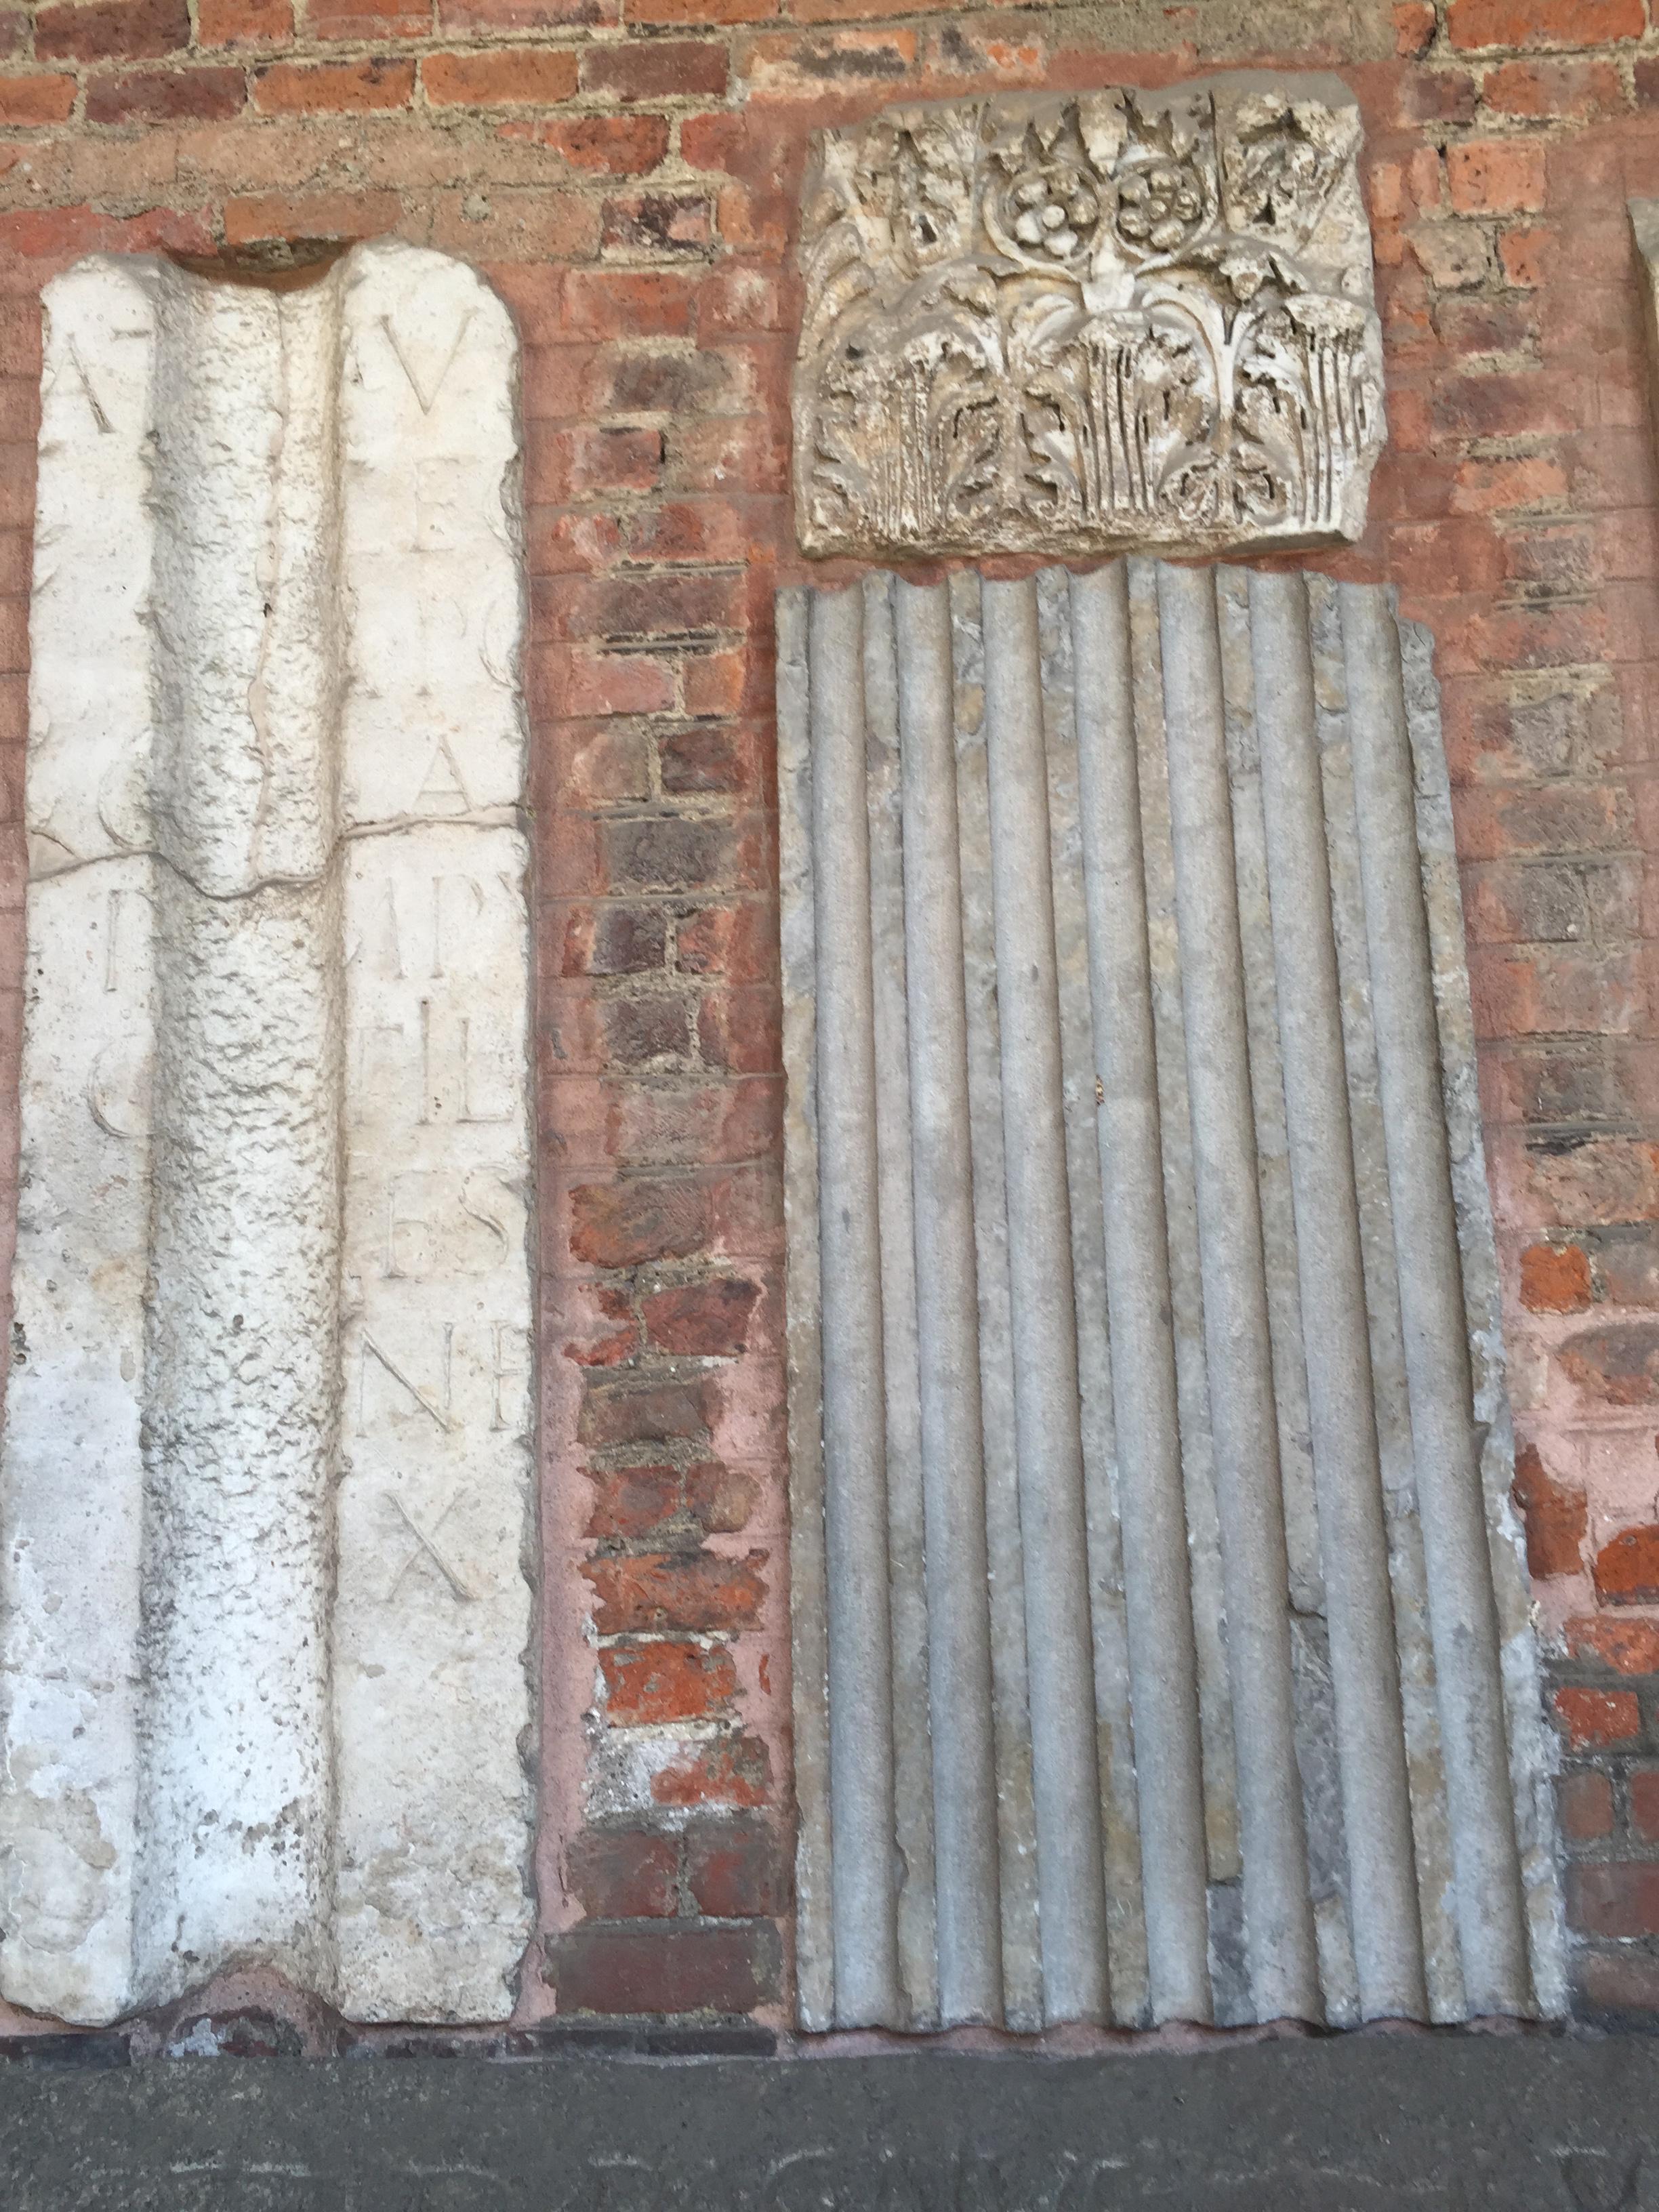 S. Ambrogio column frags